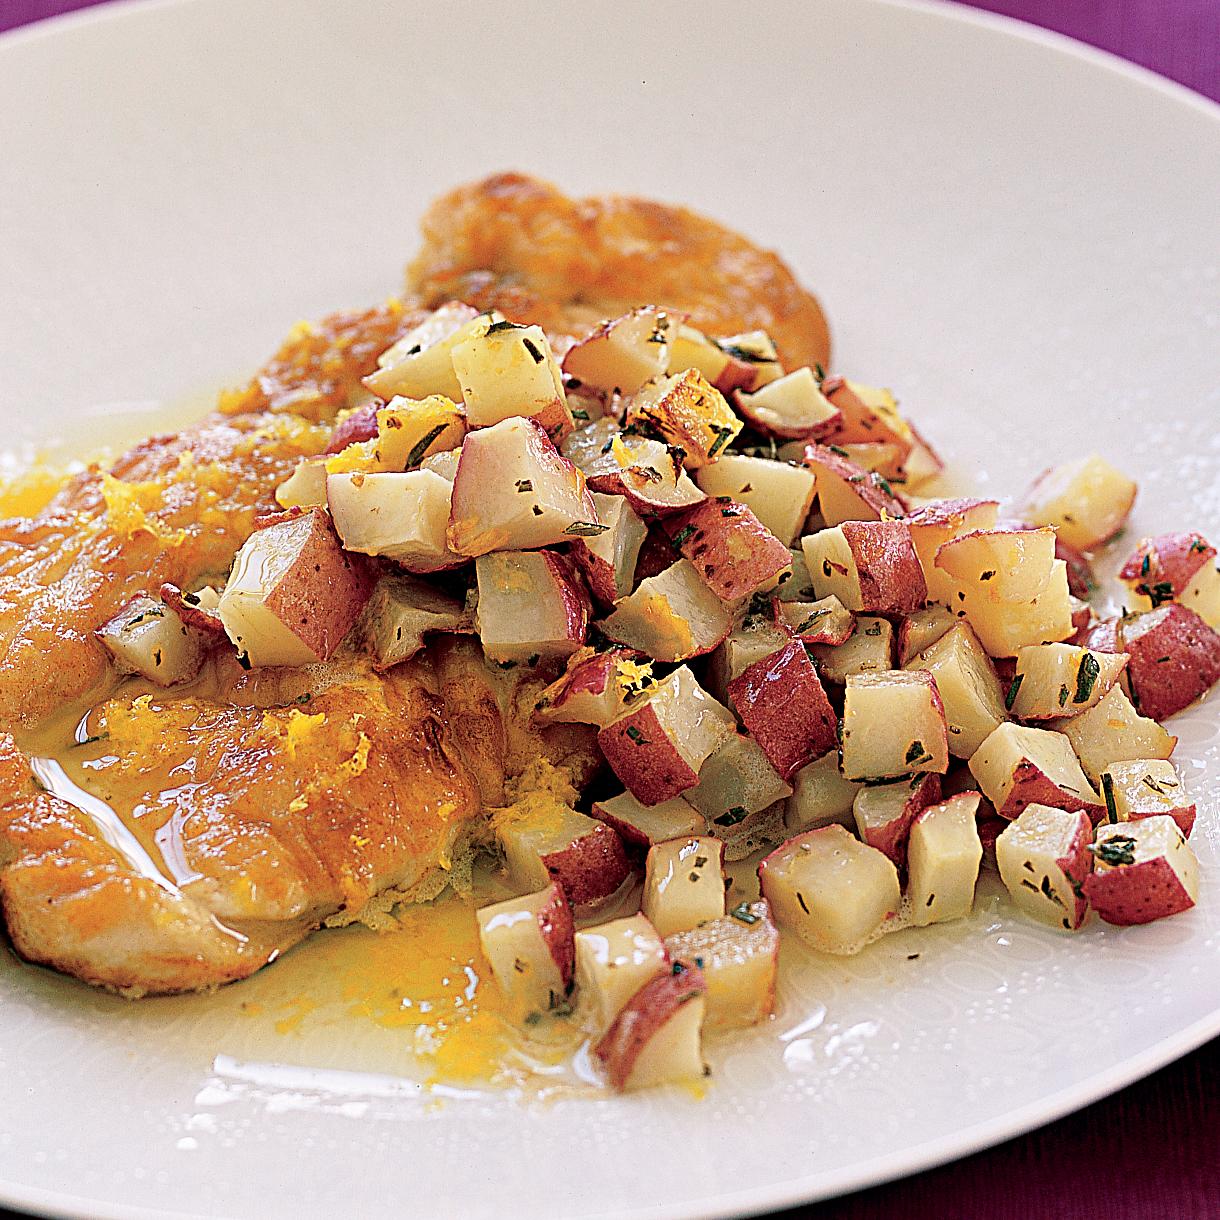 Lemon-Chicken Schnitzel with Roasted Potatoes